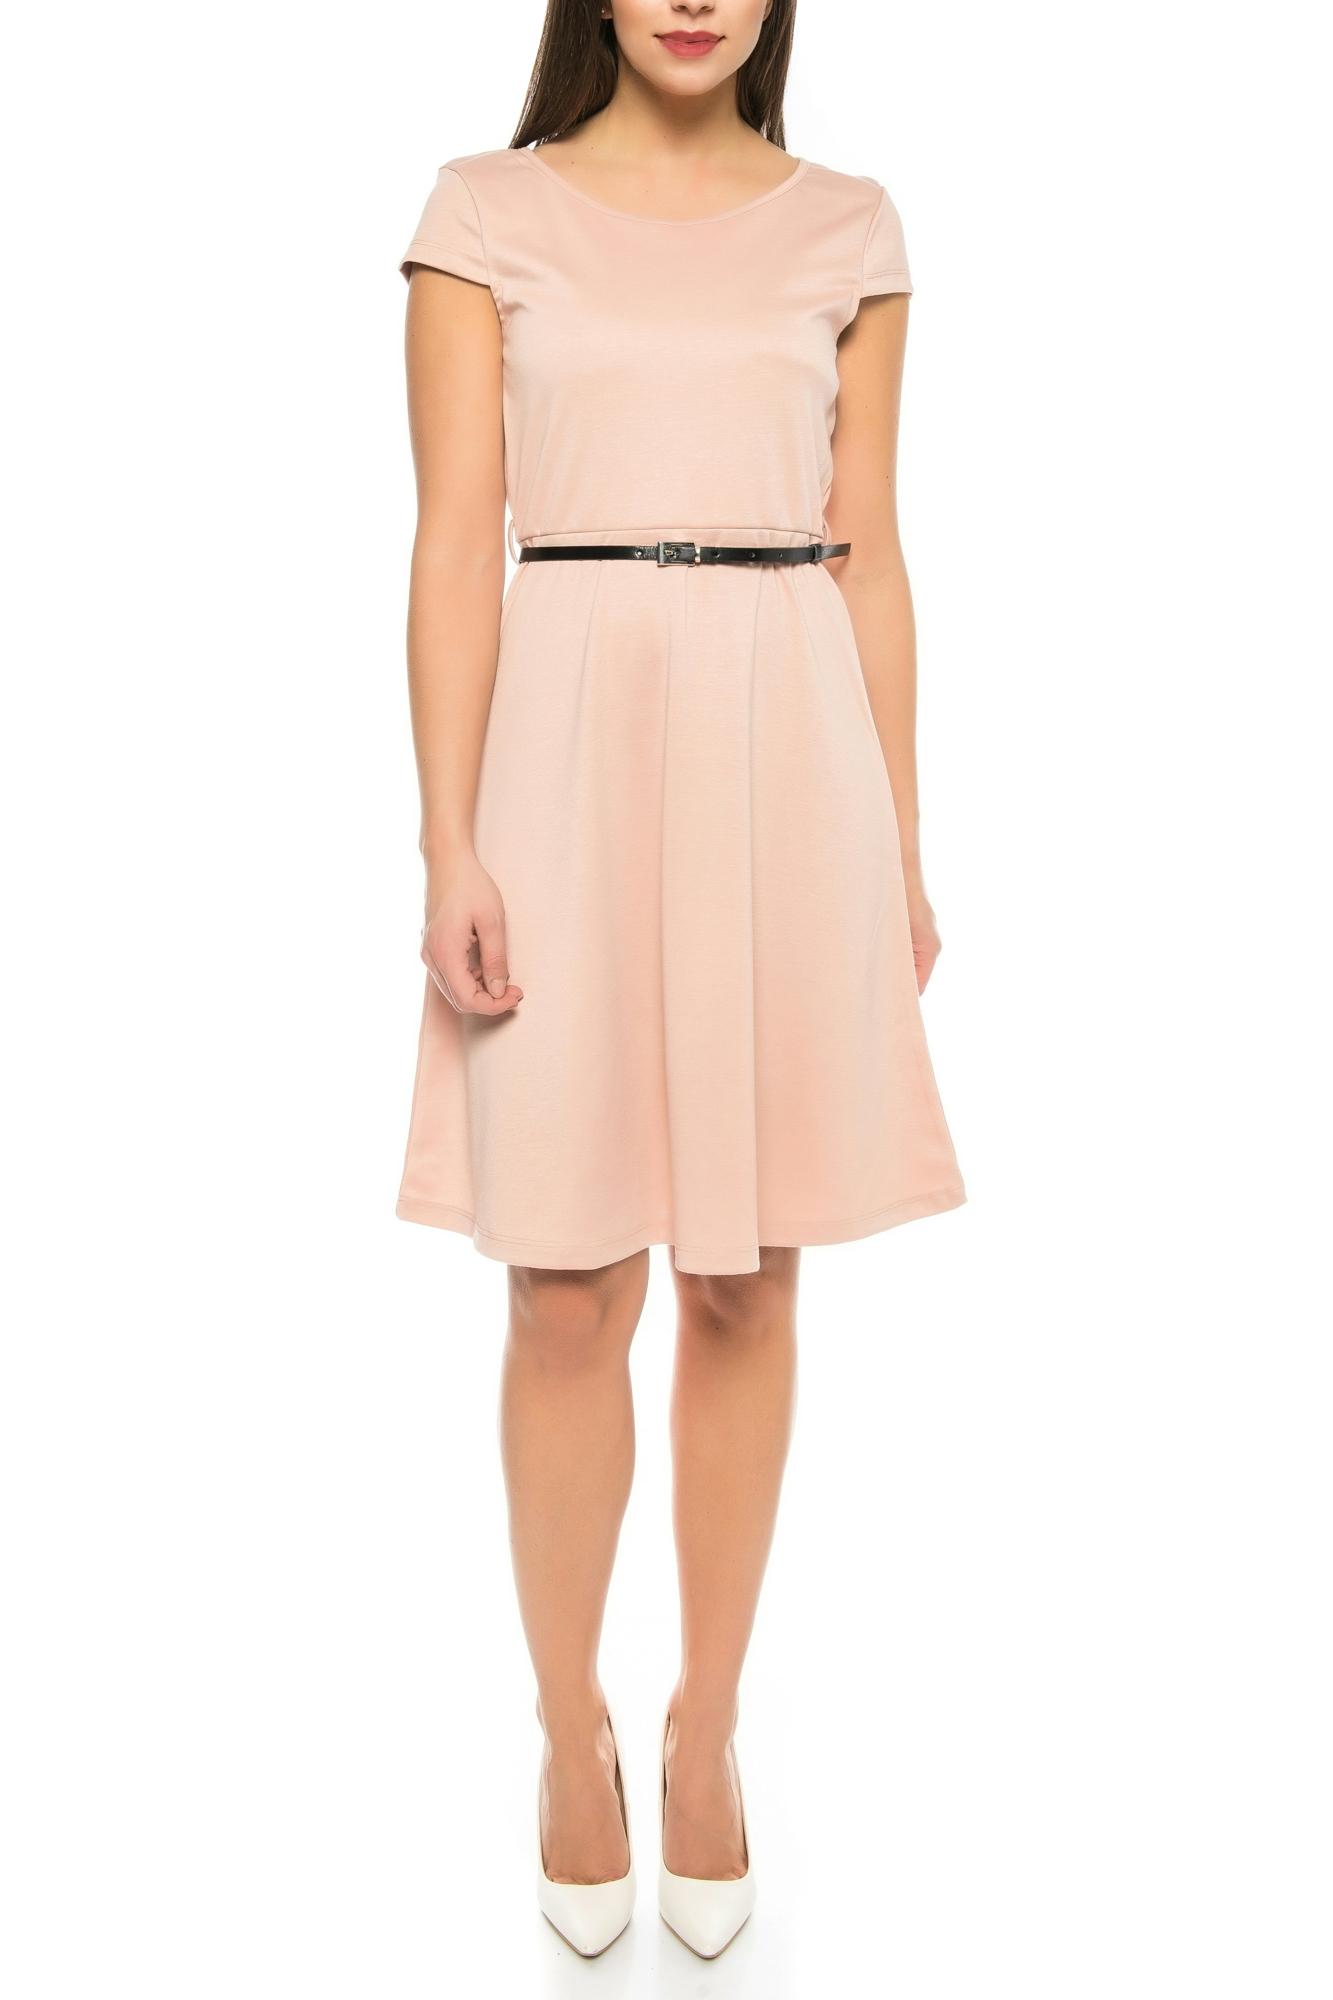 details zu vero moda damen kleid kurzarm xs s m l xl gürtel knielang rosa  schwarz weiß neu